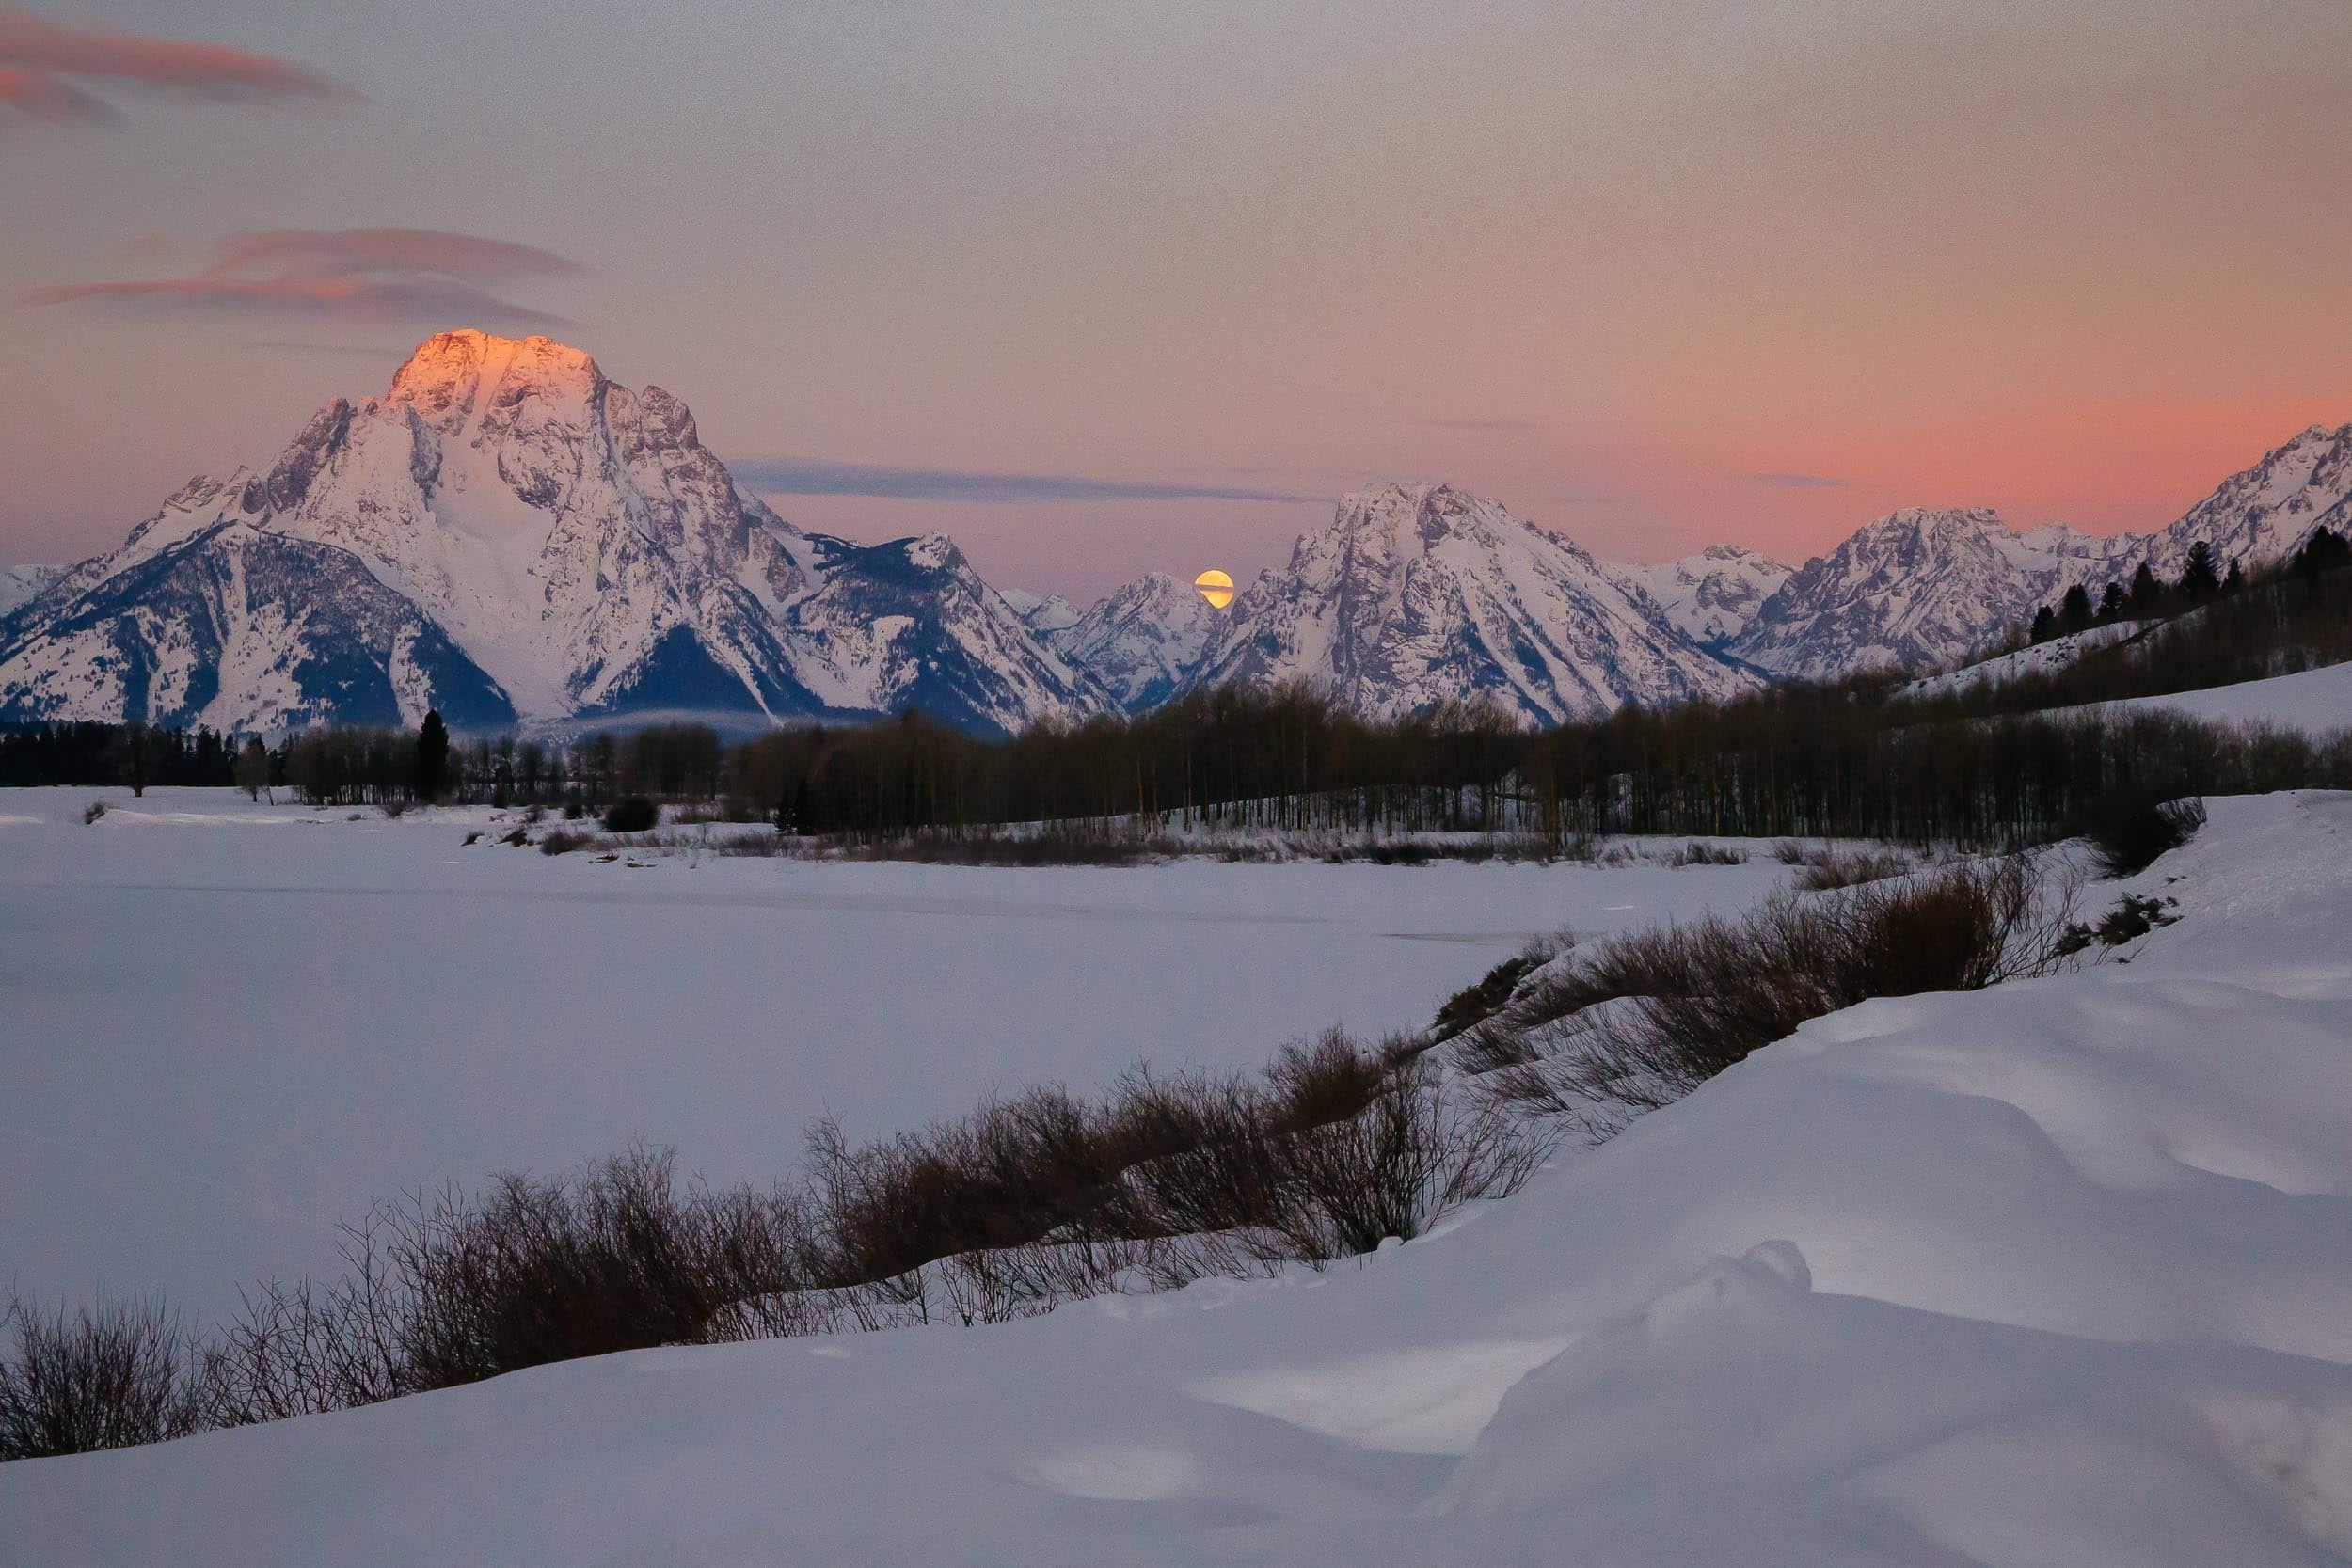 Teton Photo Adventures - Sunrise Moonset Wyoming Winter Mountains